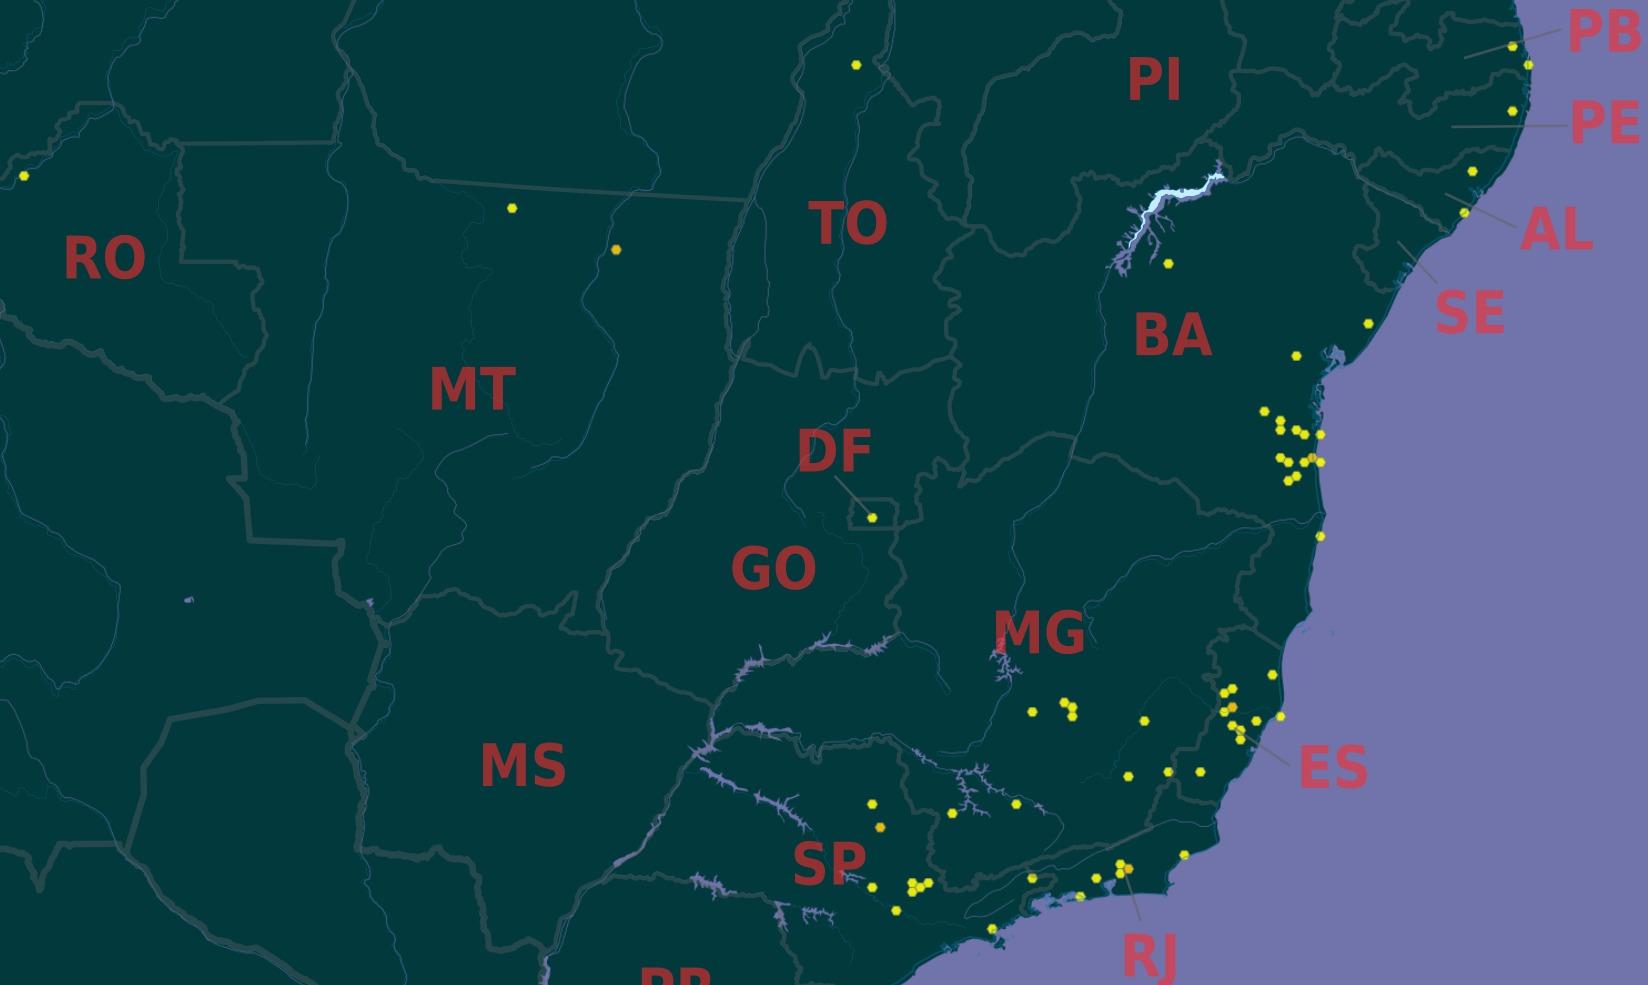 Map of <i>Cariniana legalis</i> (Mart.) Kuntze